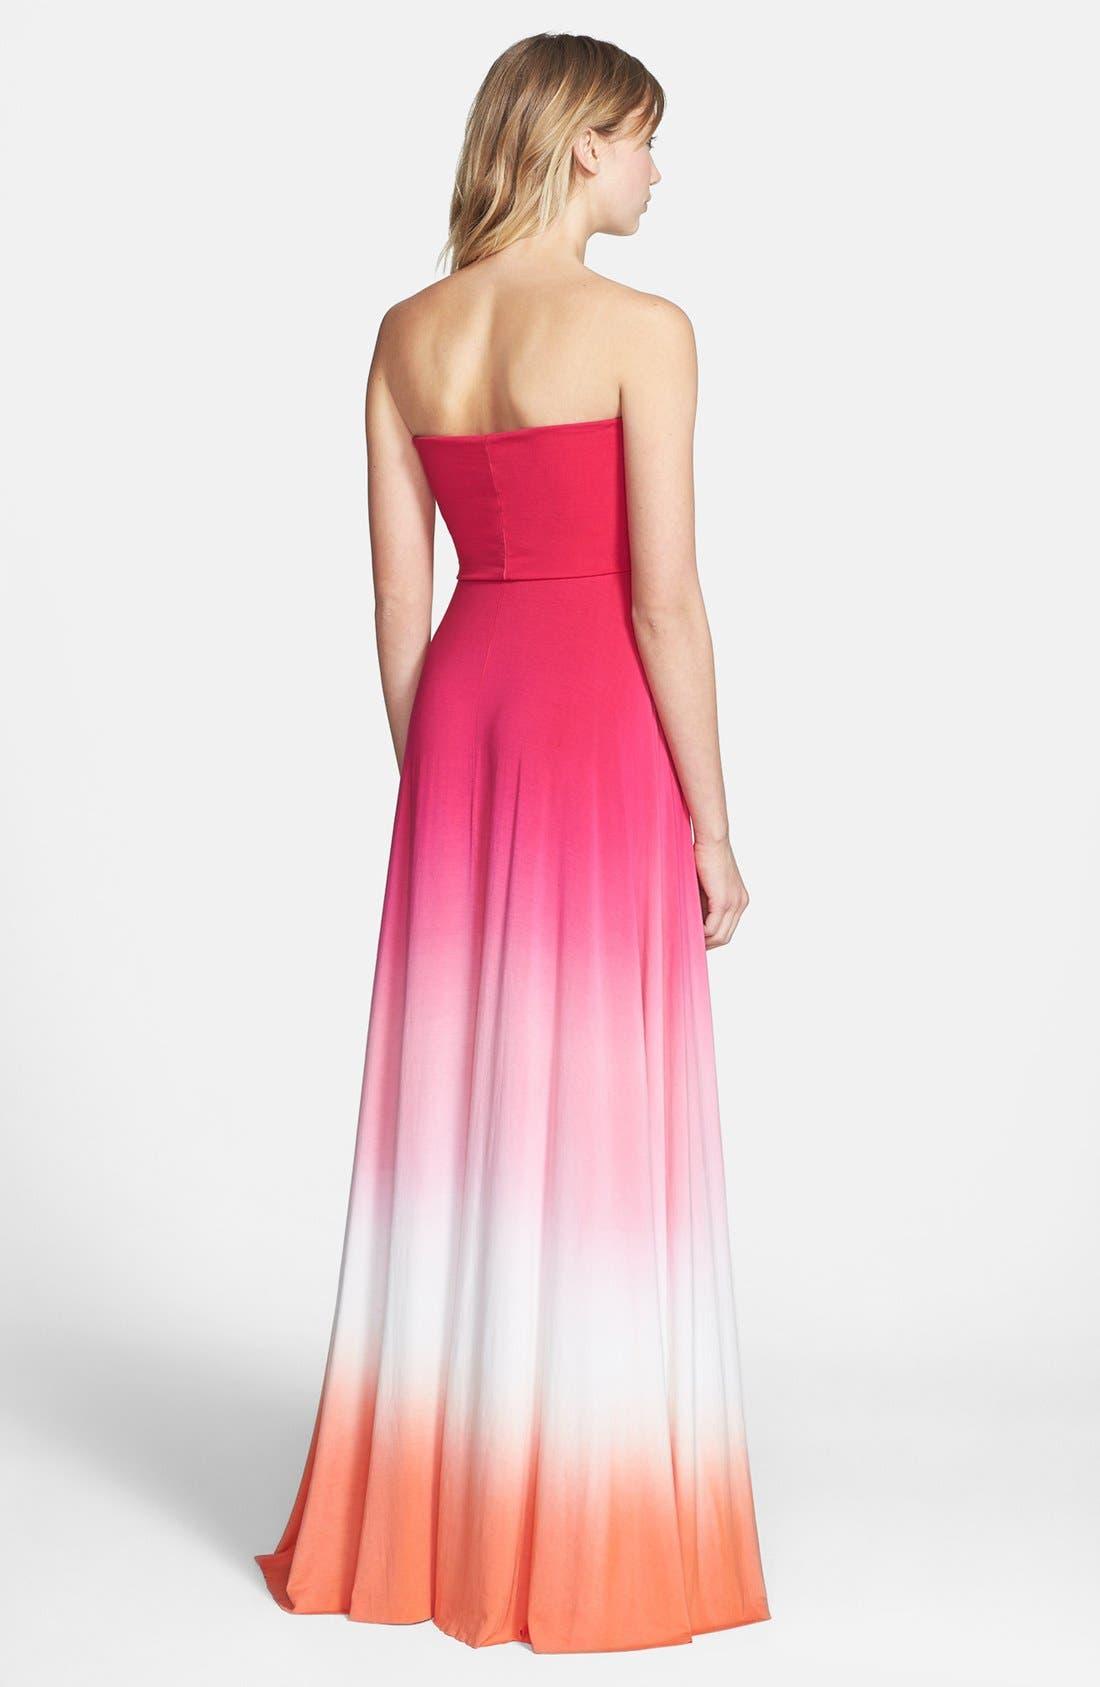 Alternate Image 2  - Young, Fabulous & Broke 'Bangal' Convertible Maxi Dress